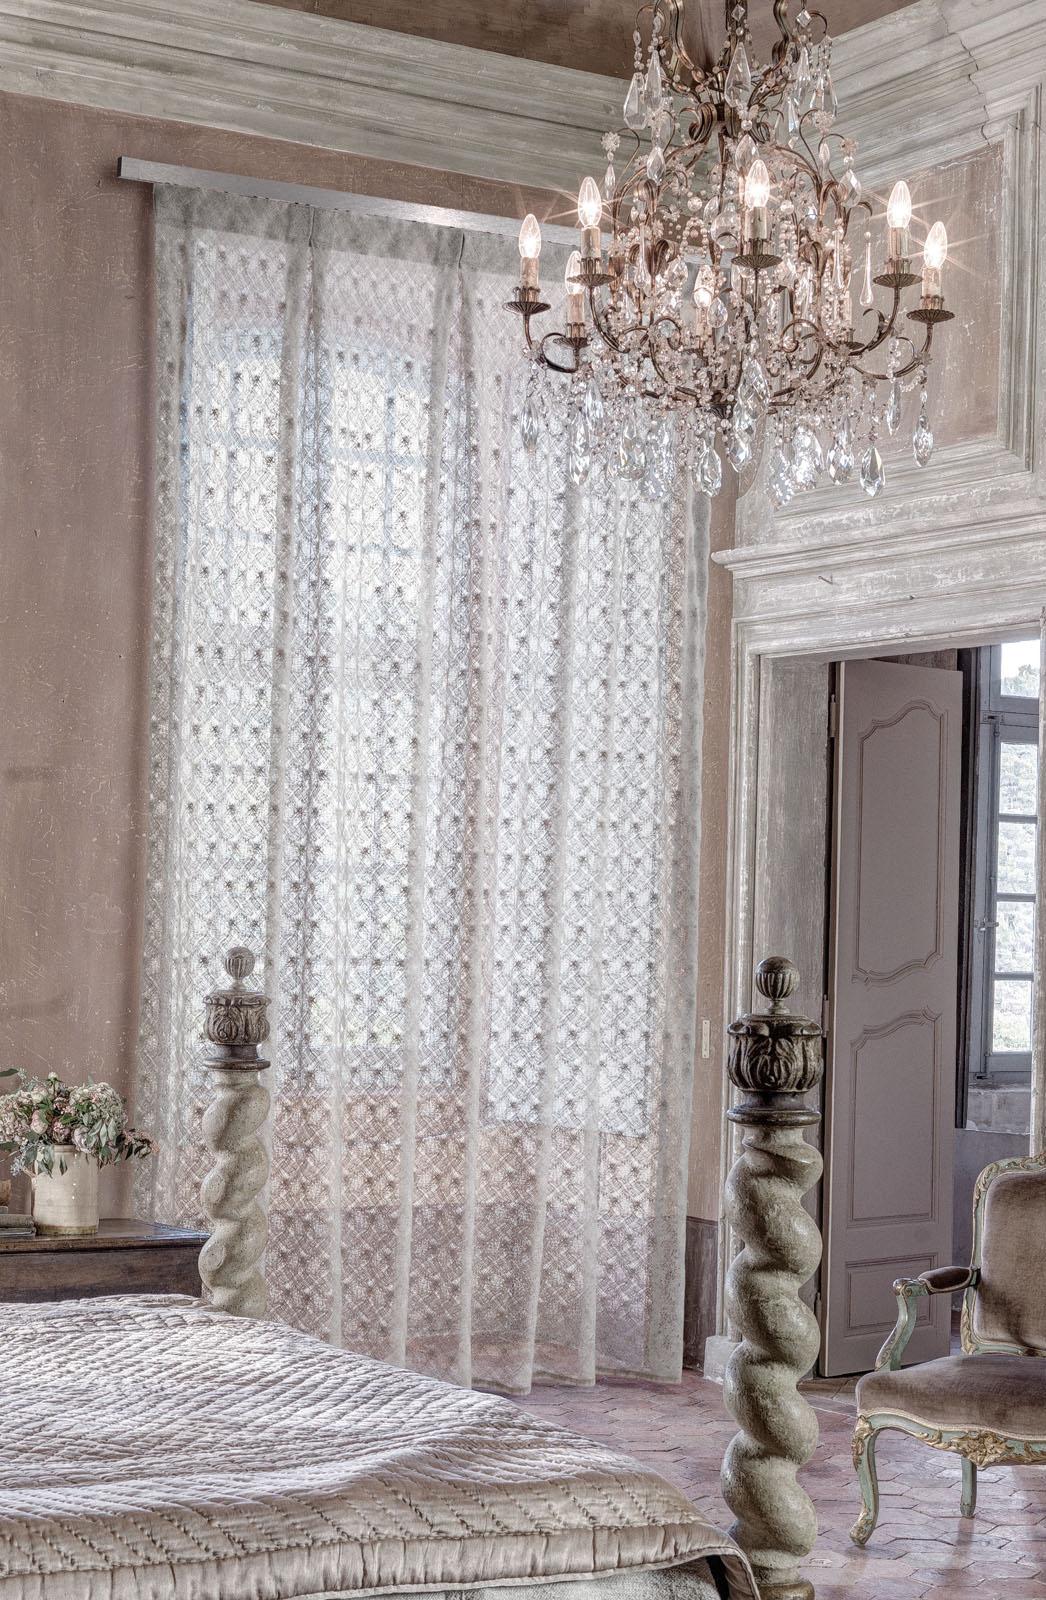 ciesse-tendaggi-collezione-home-articolo-Break-ciesse-tendaggi-tessuti-verona-tendaggi-pregiati-tende-da-interno-tessuti-eleganti-tende-per-casa-classica-tende-su-misura-tessuti-design-arredo